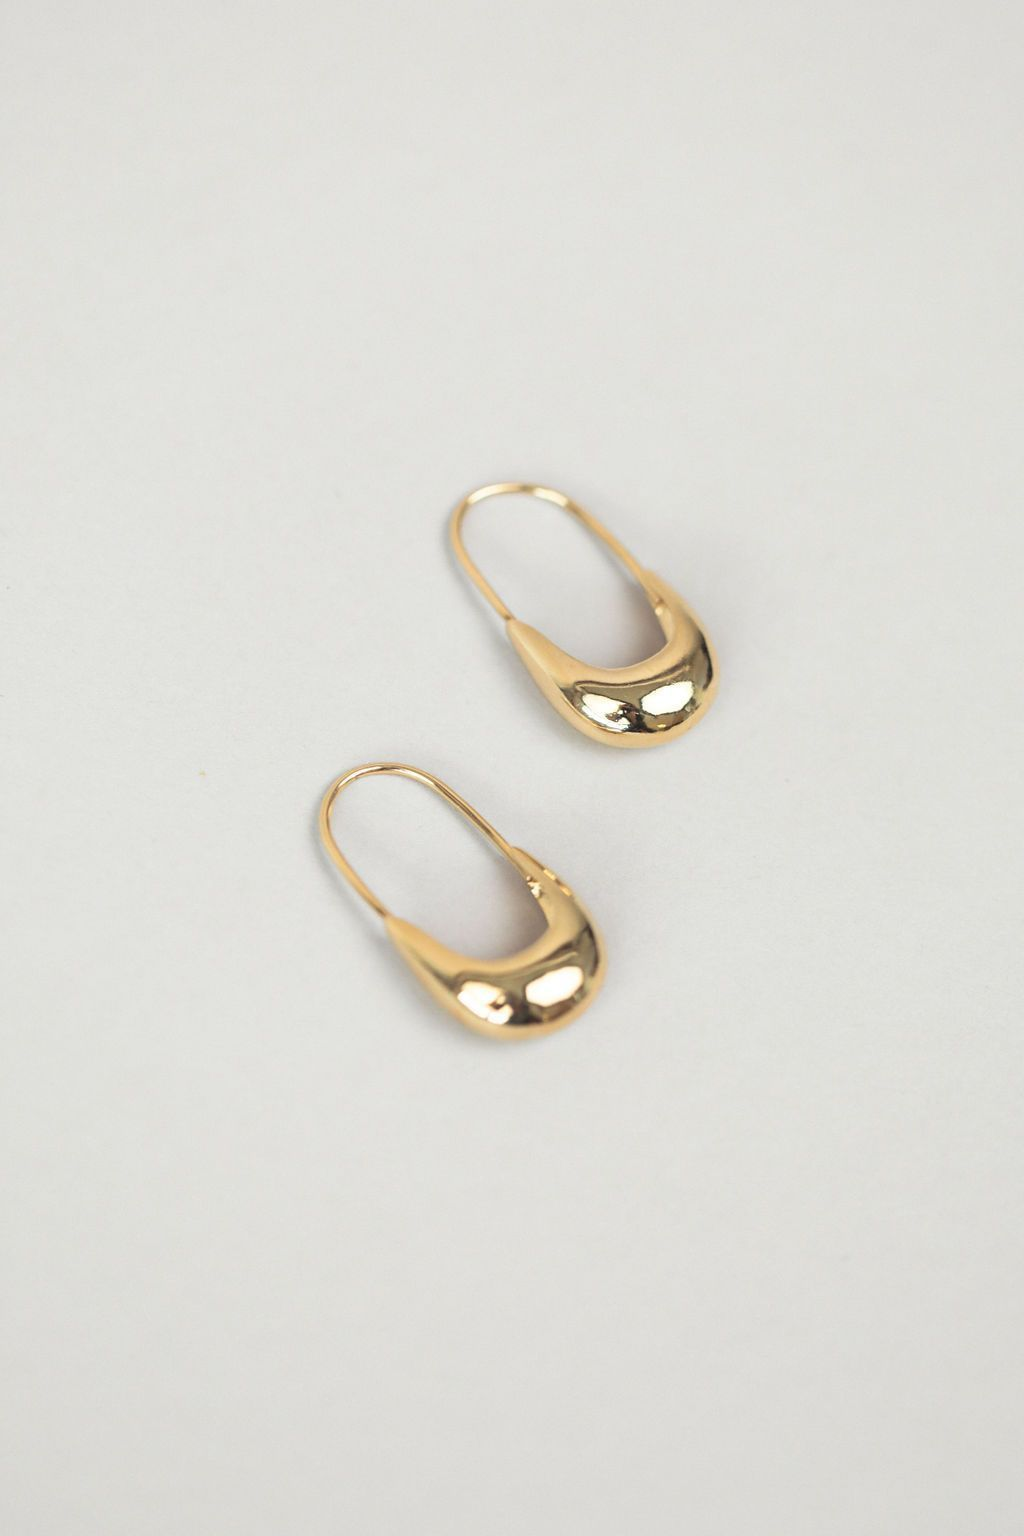 Wolf Circus Marta Earrings Gold  Gold earrings  Daphe Blog Wolf Circus Marta Earrings Gold  Gold earrings